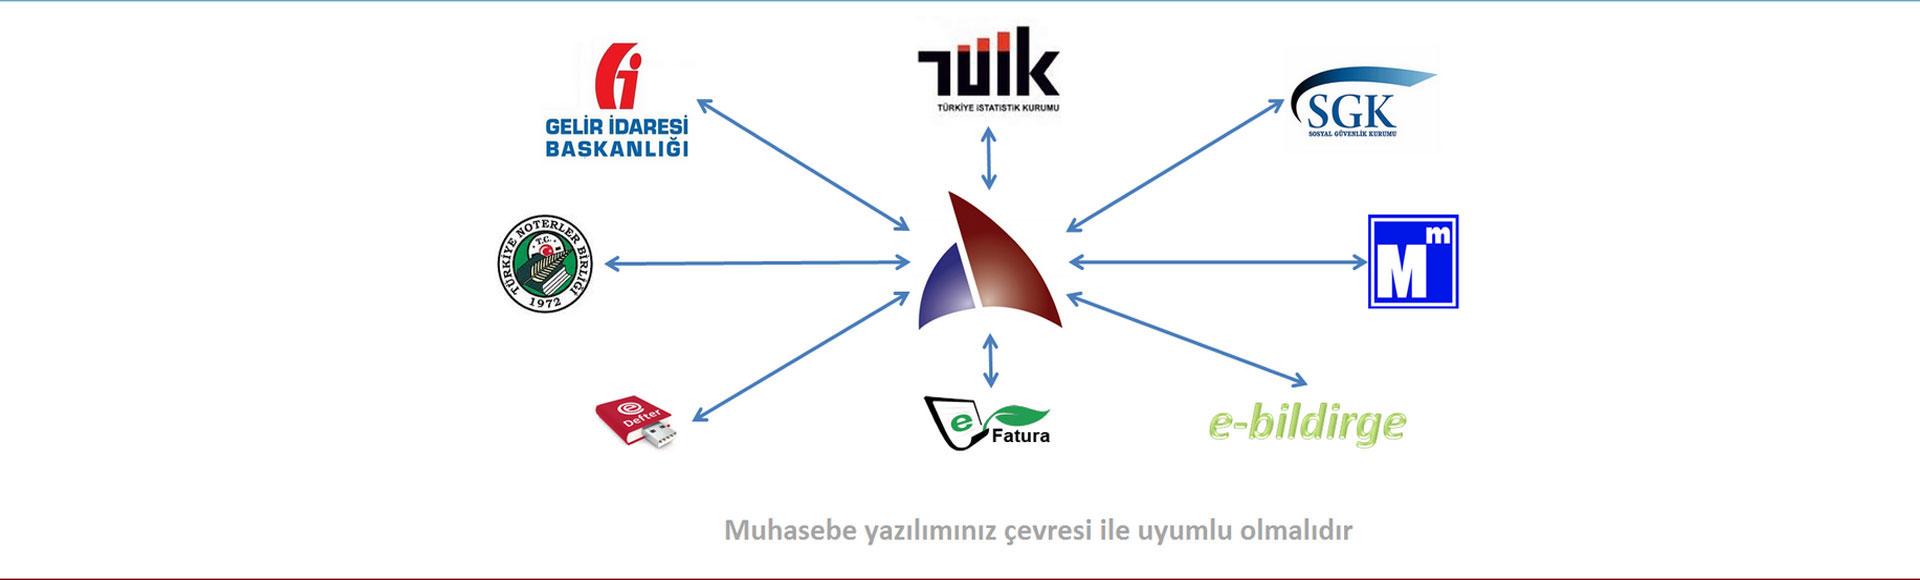 mikrokom_muhasebe_uyumlu